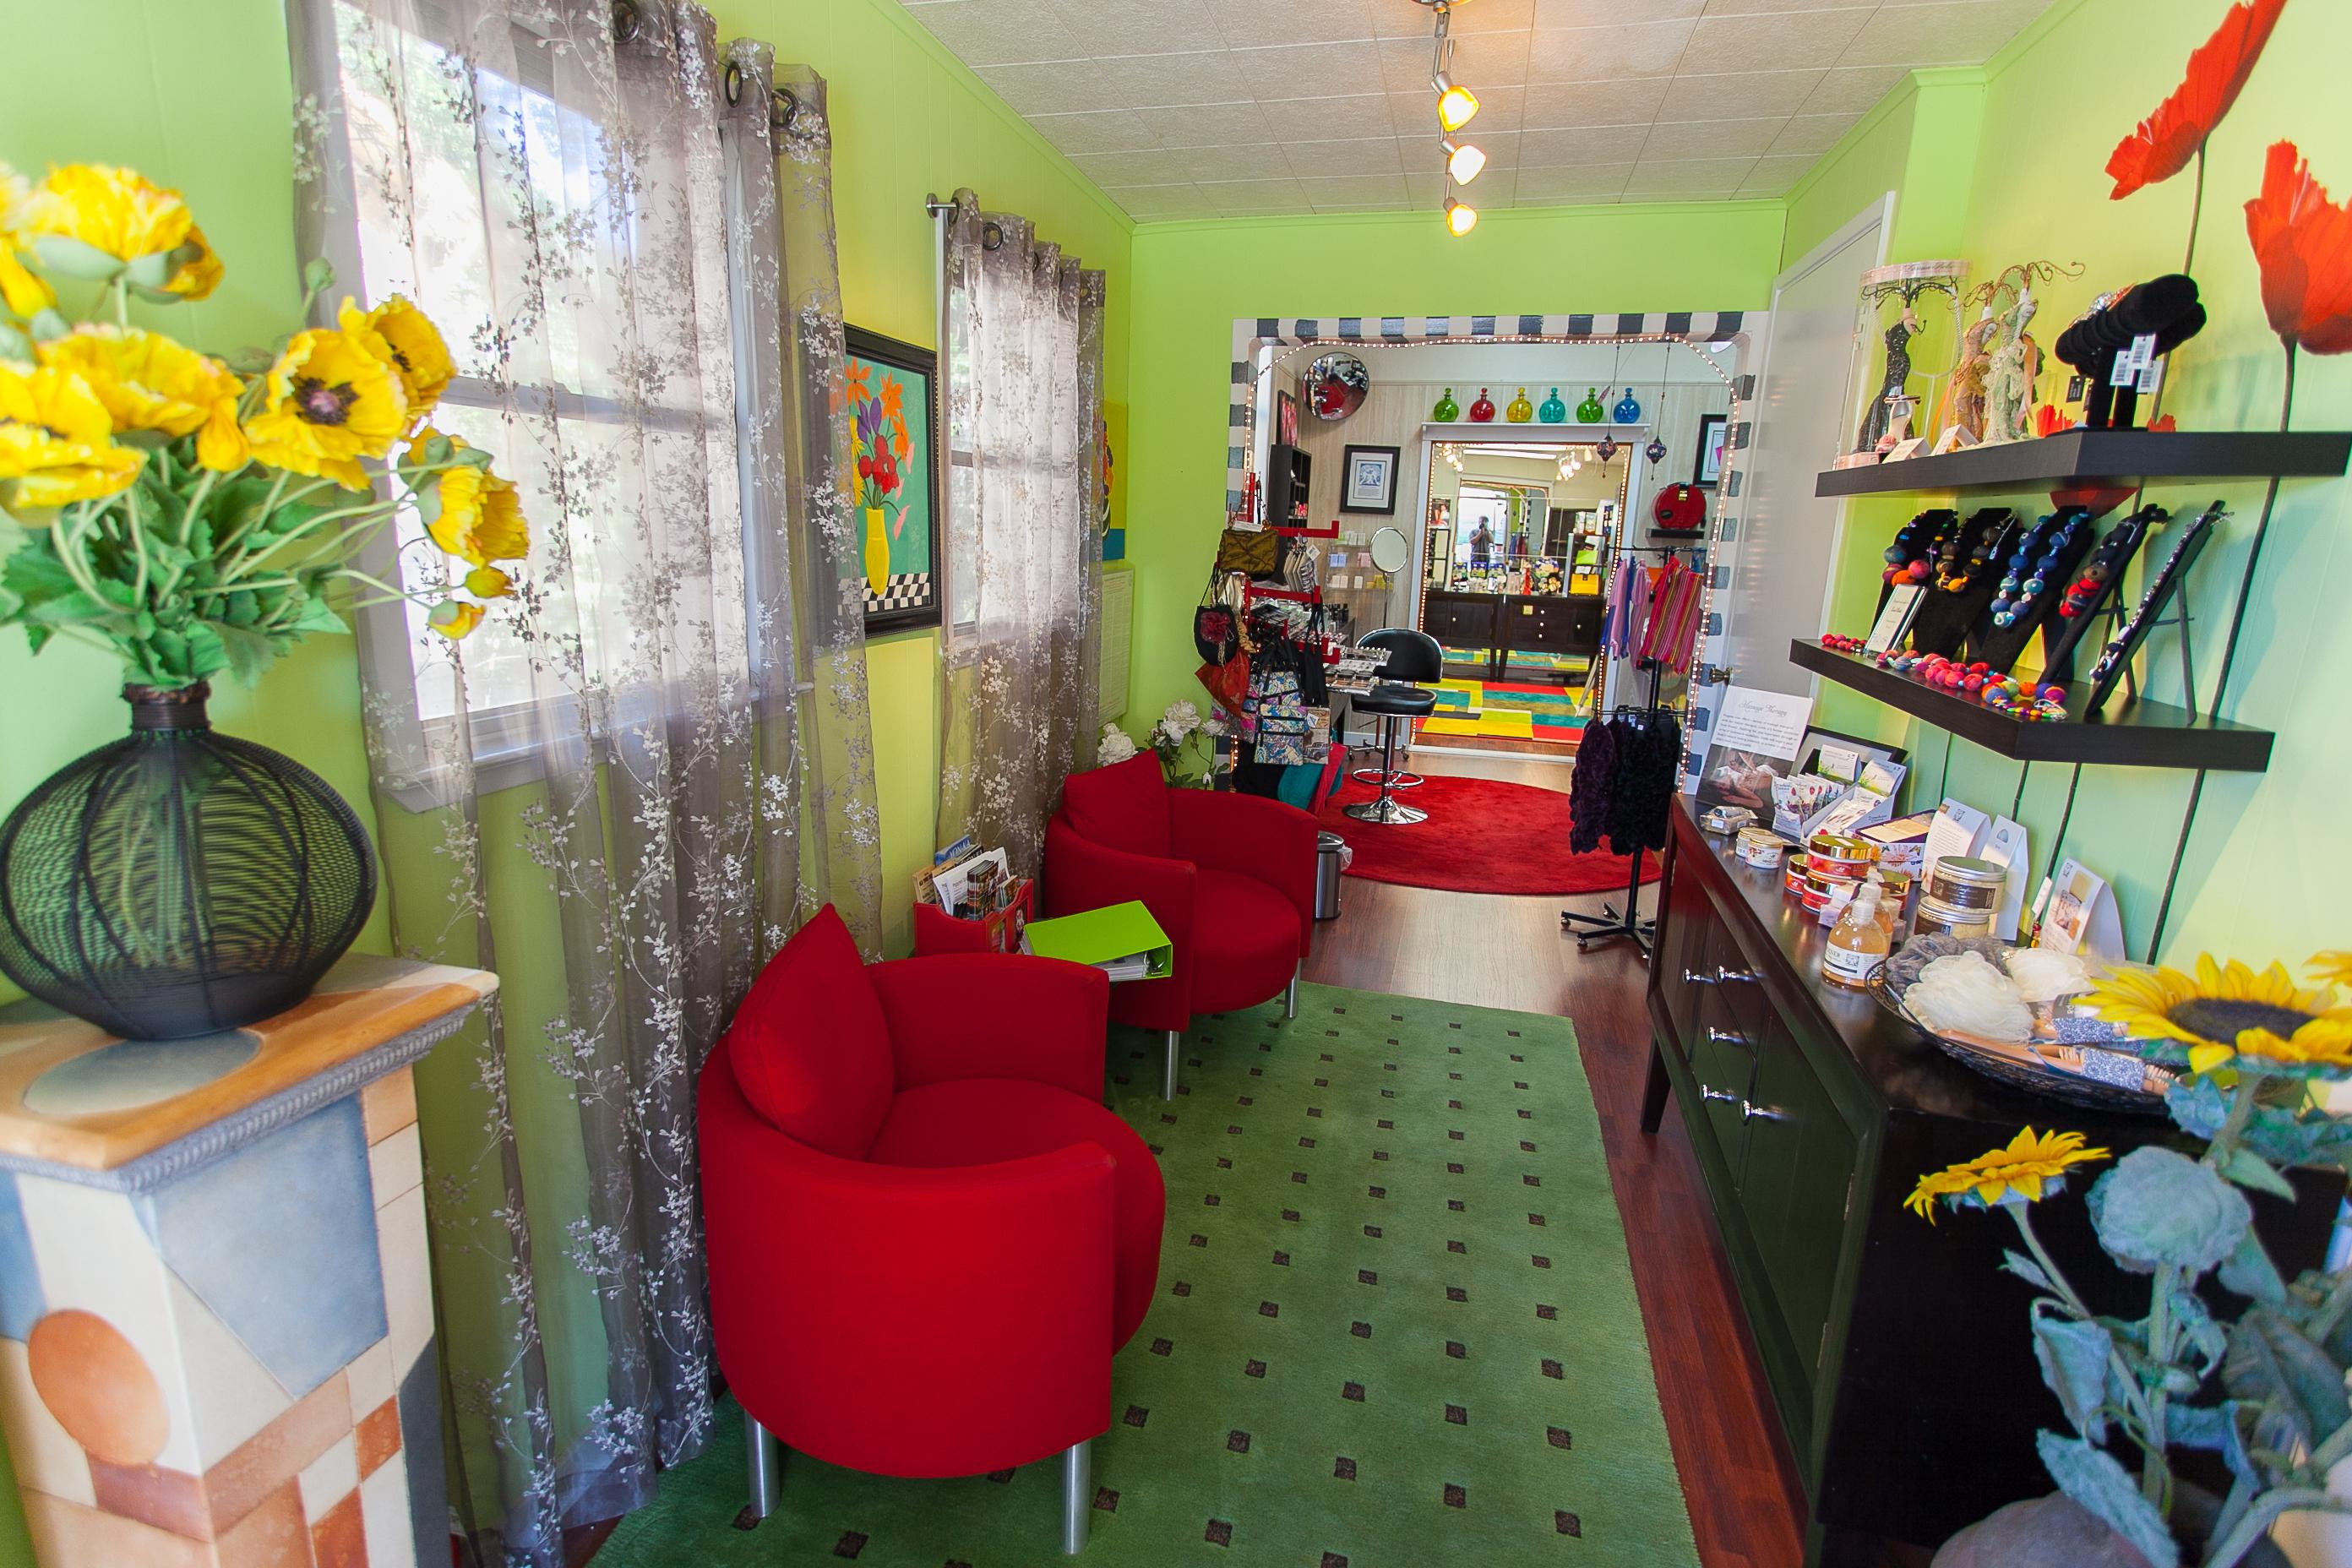 Poppies Spa & Studio, Auburn CA